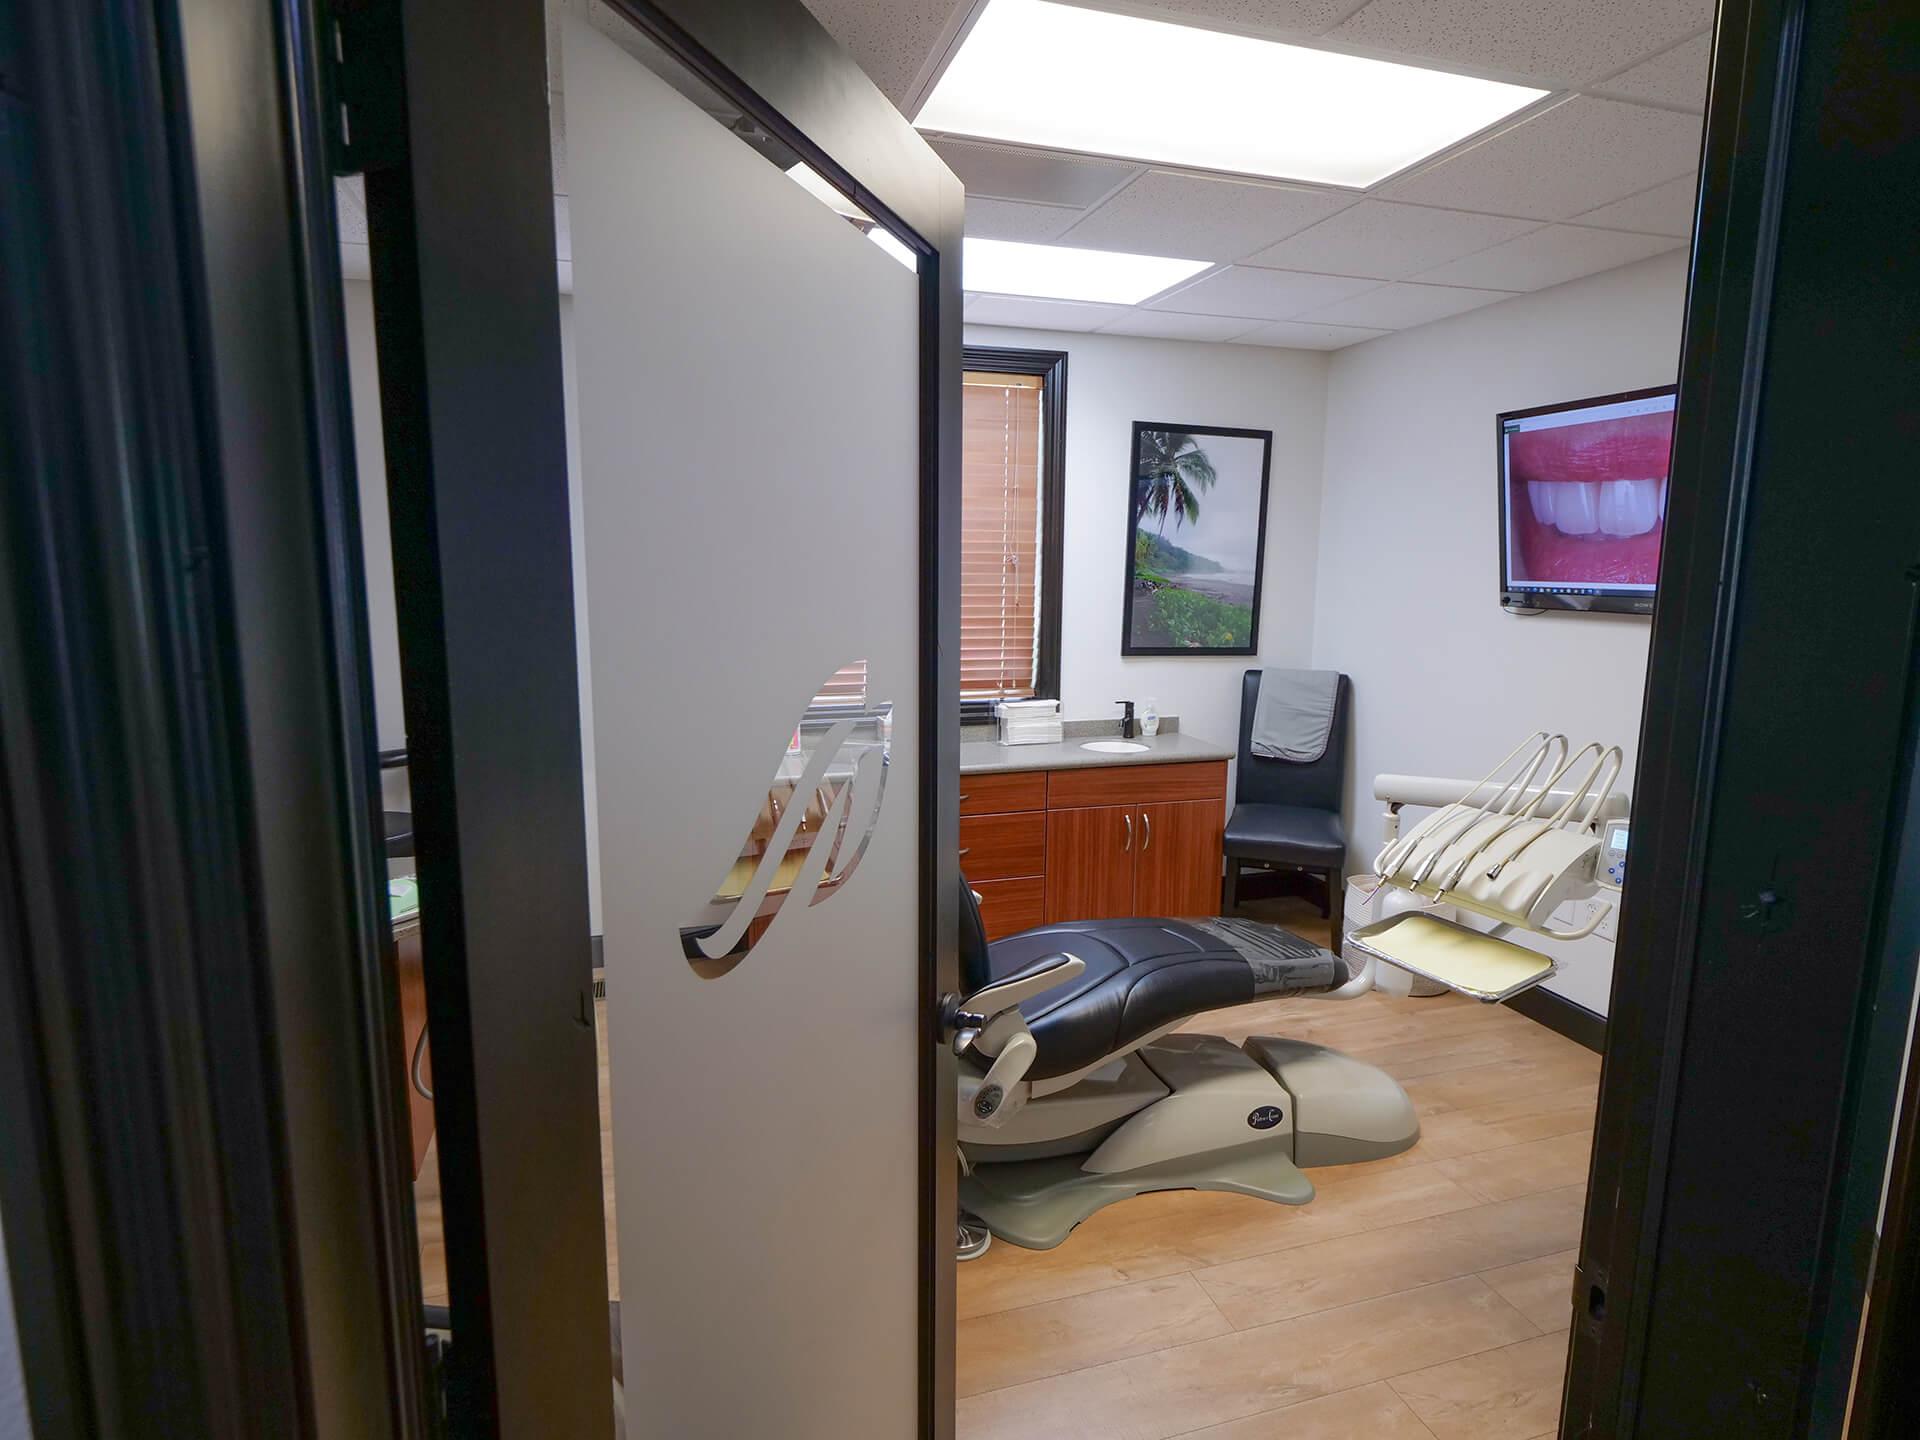 Aesthetic Smiles Office Photo-4